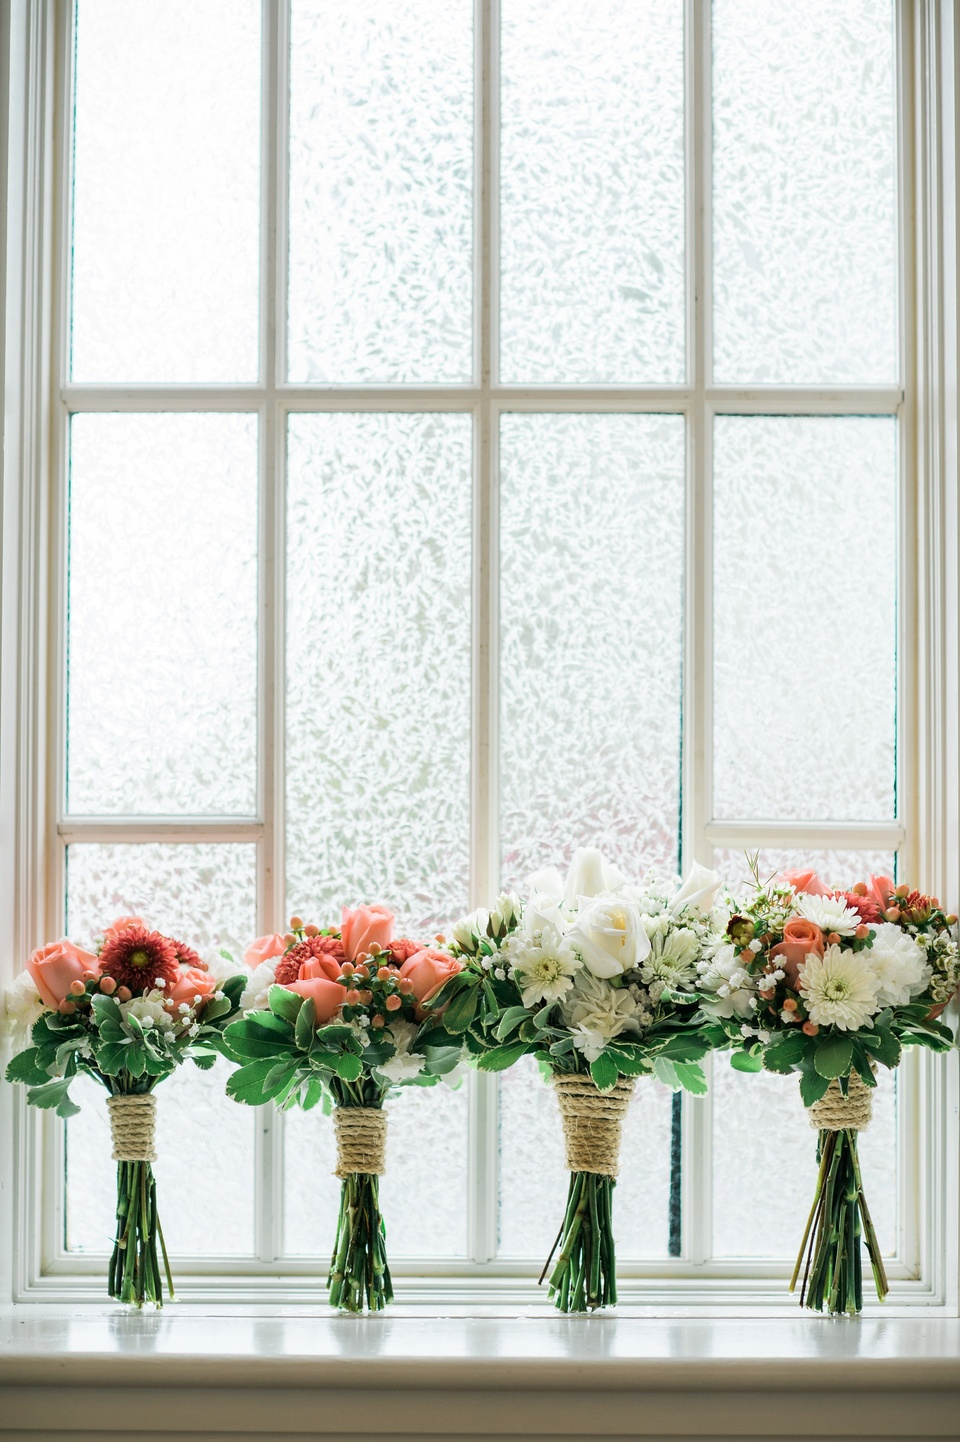 edenton-nc-wedding